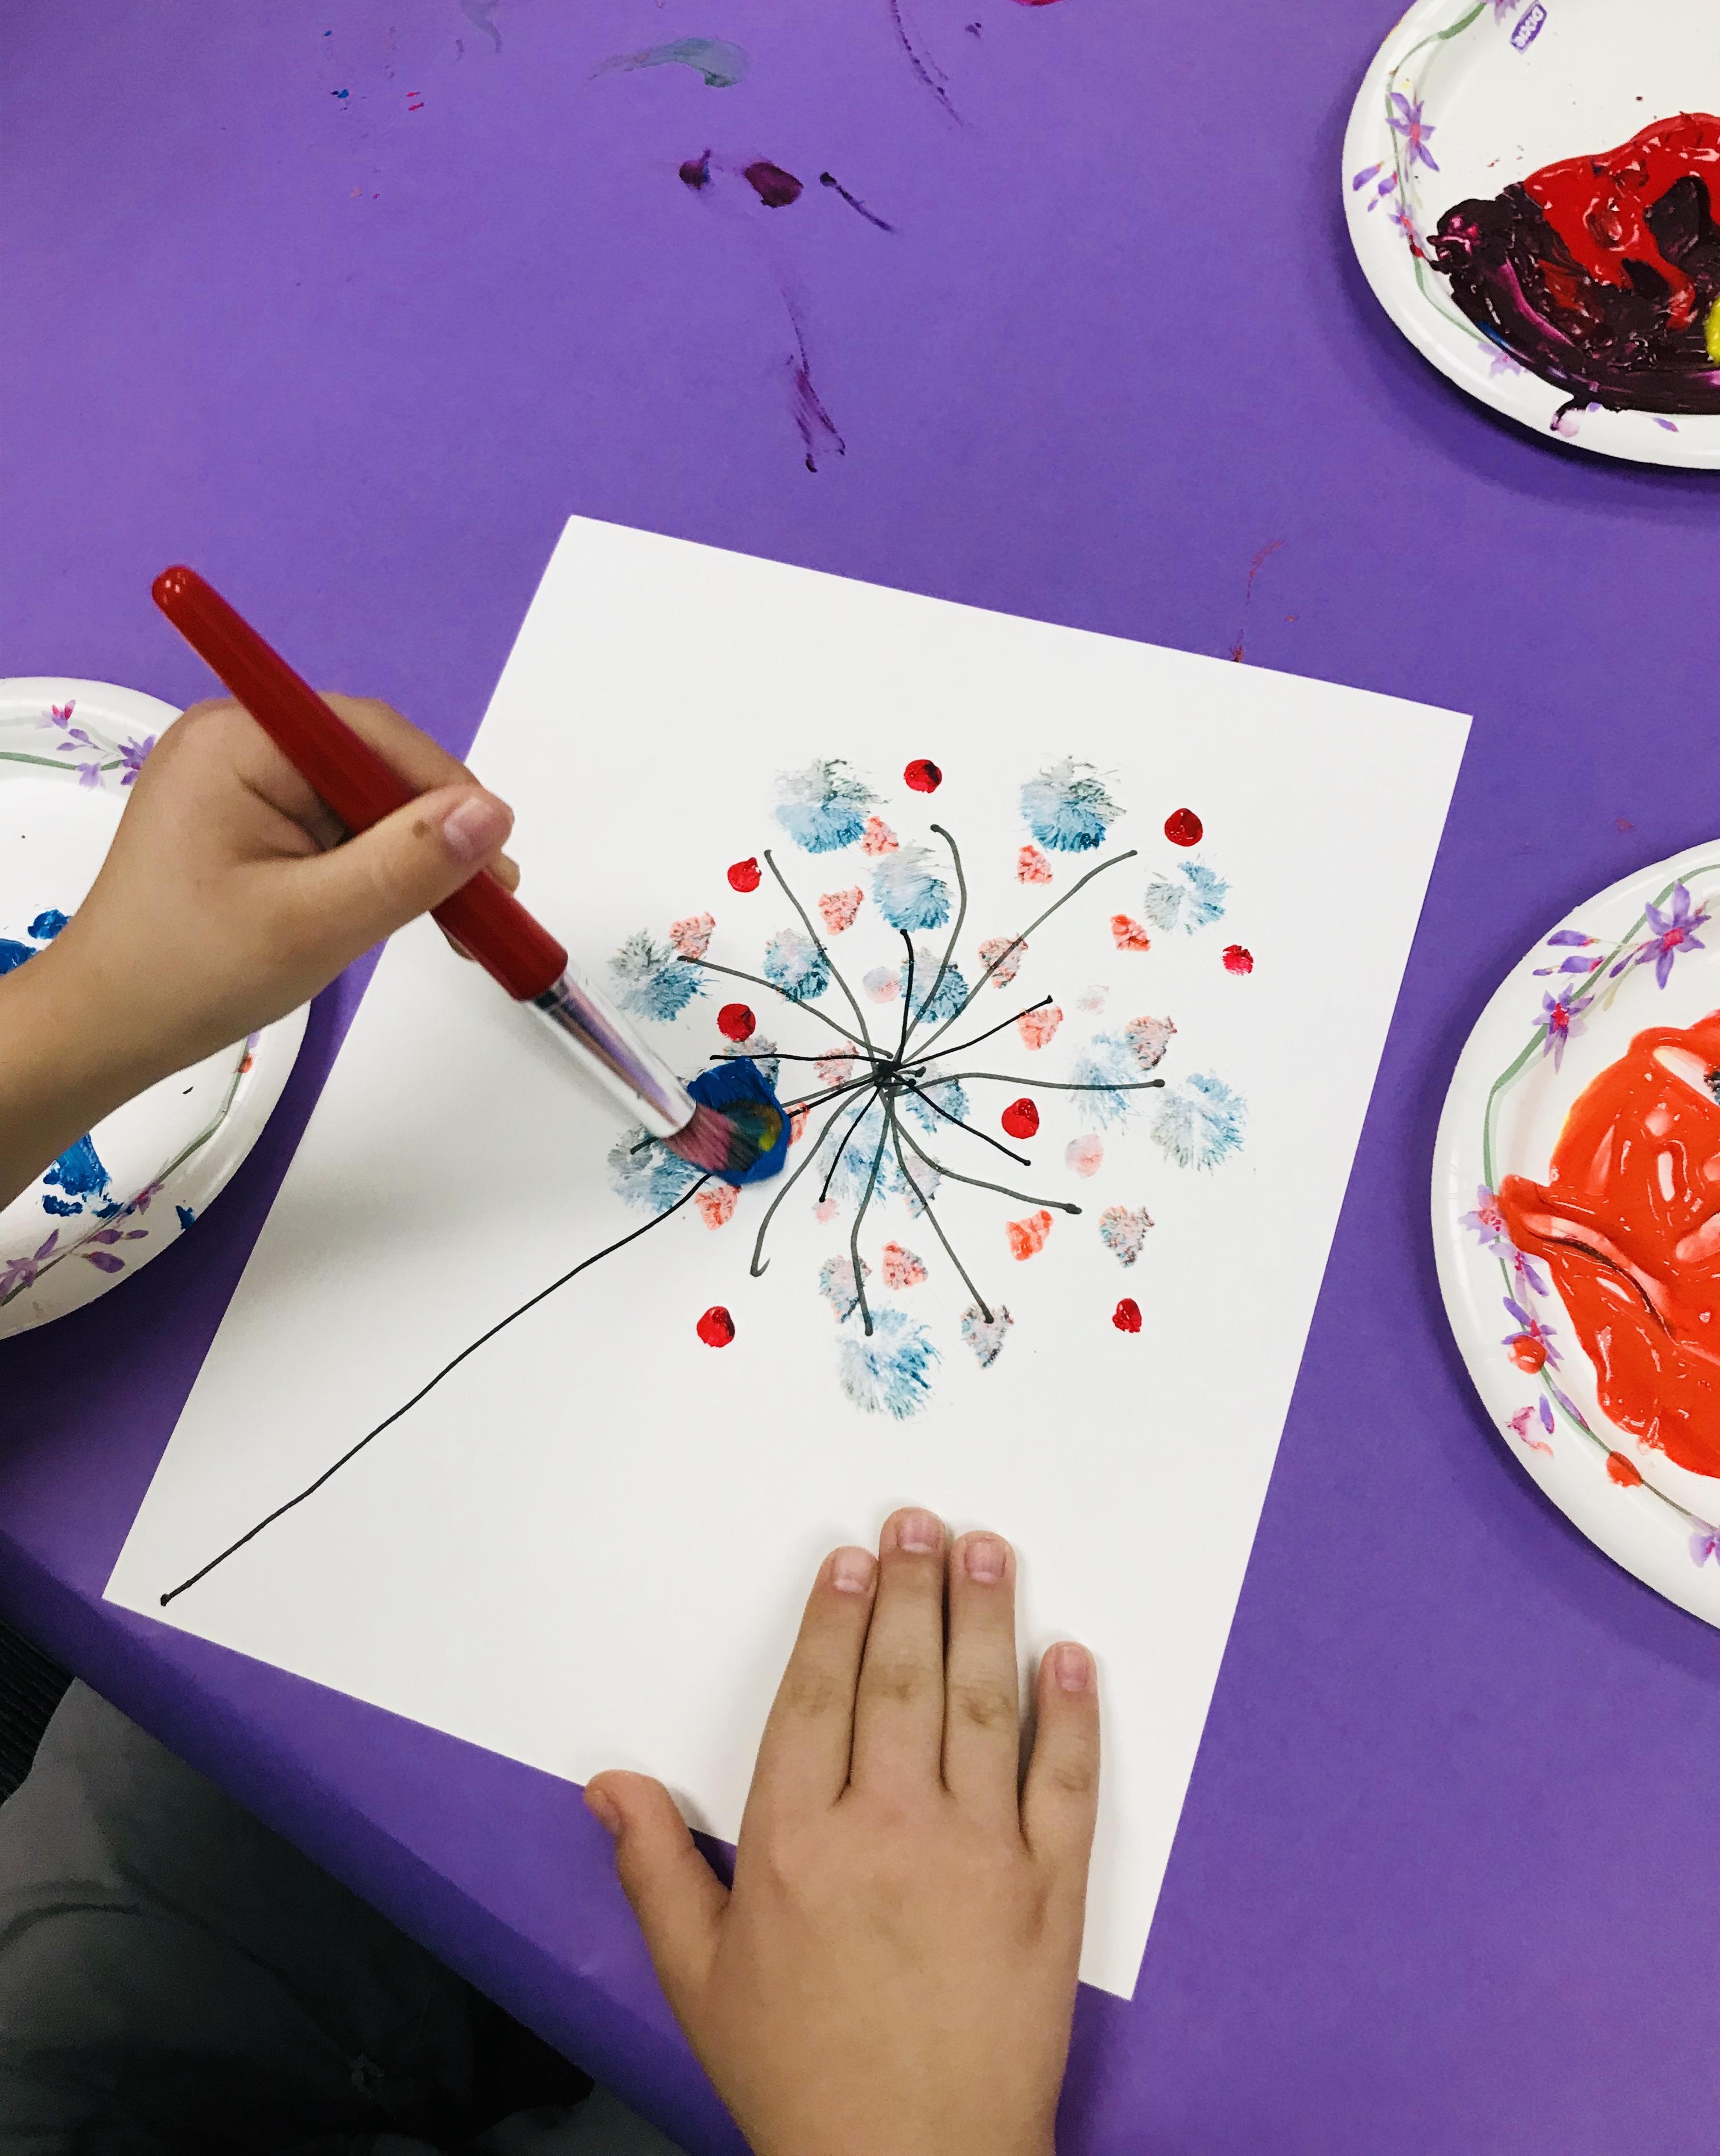 Paint brushing circles on dandelion stem